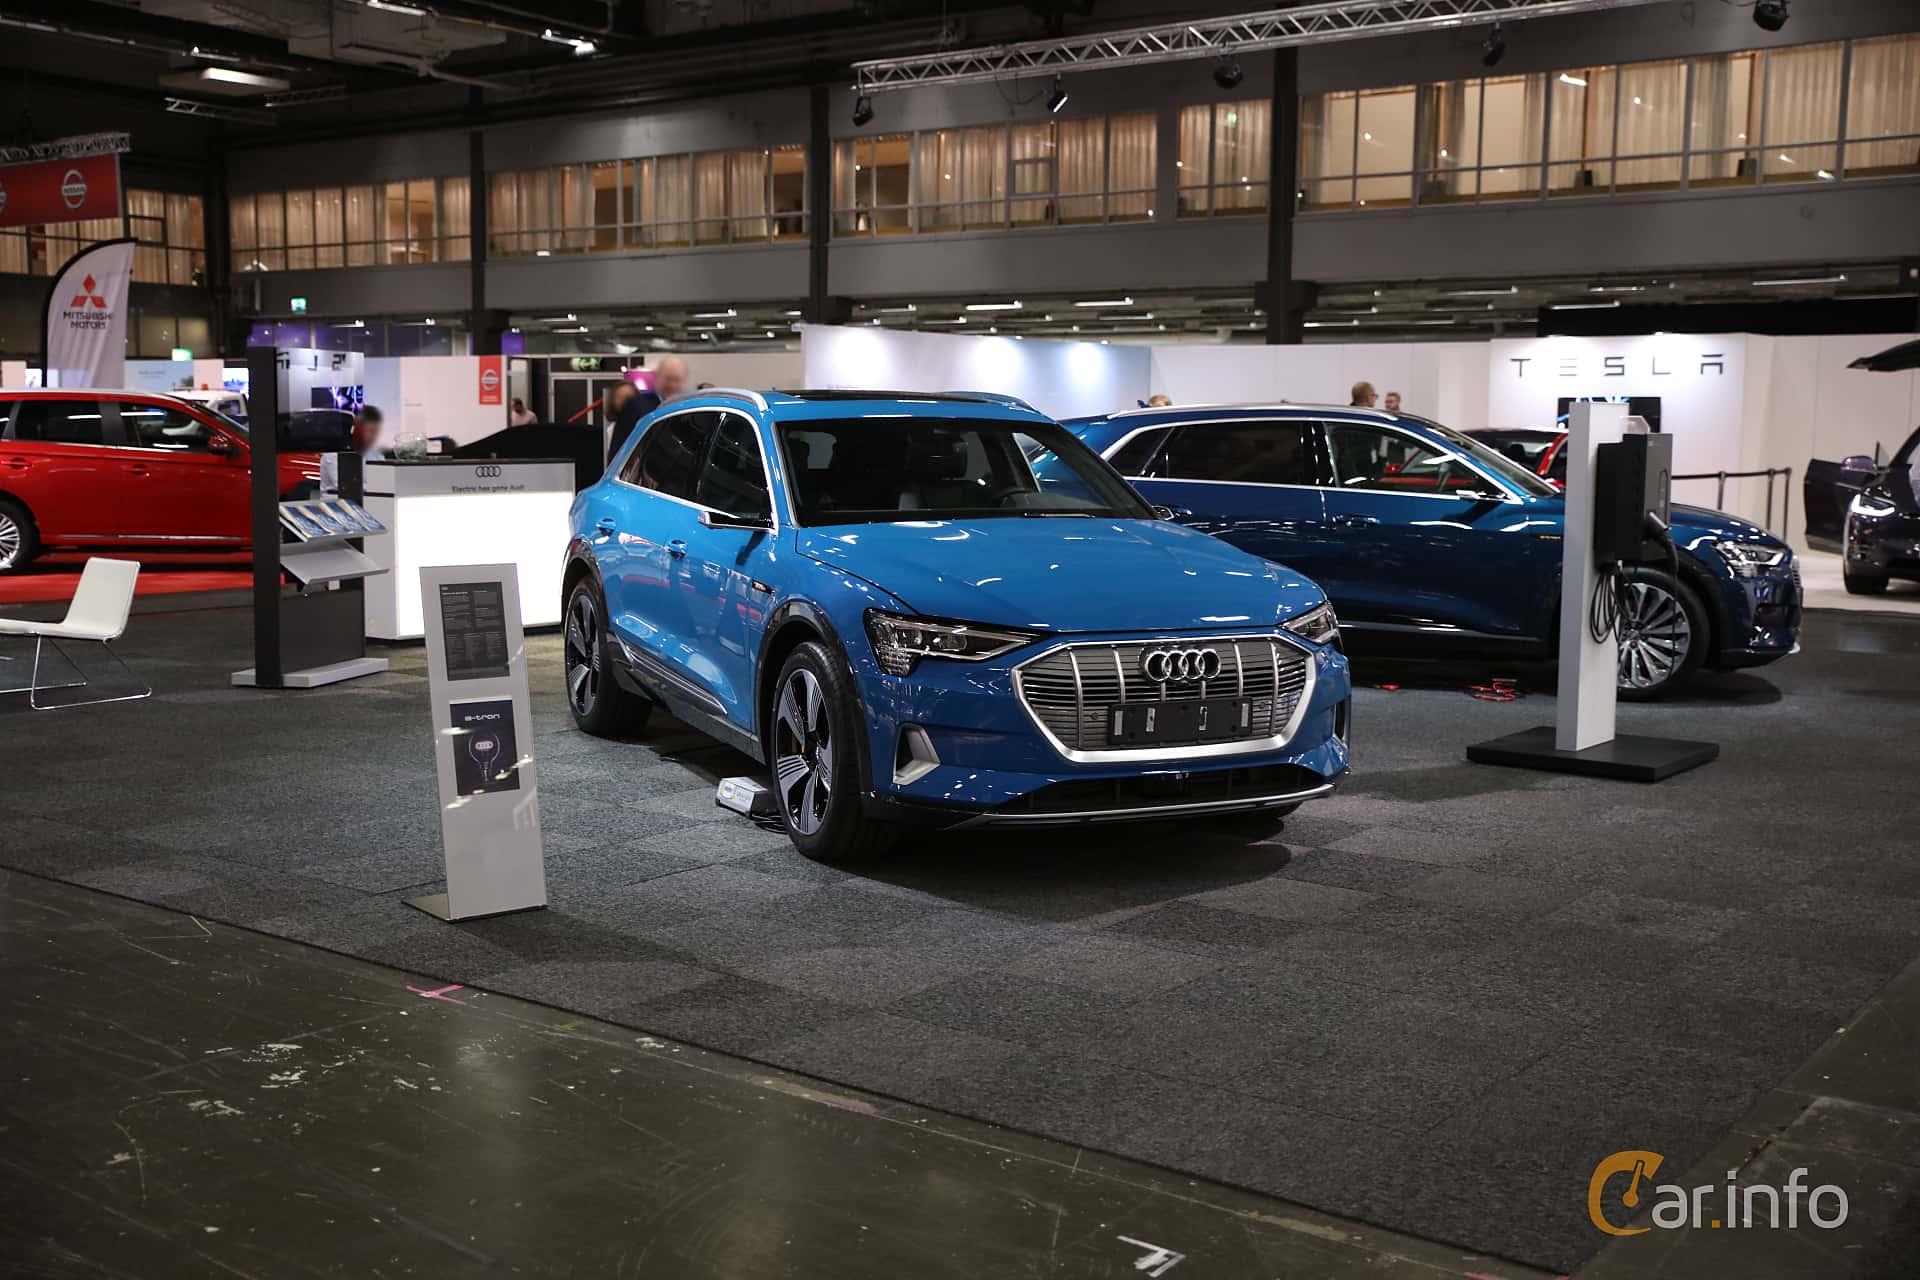 Audi e-tron 55 quattro  Single Speed, 408hp, 2019 at eCar Expo Göteborg 2018